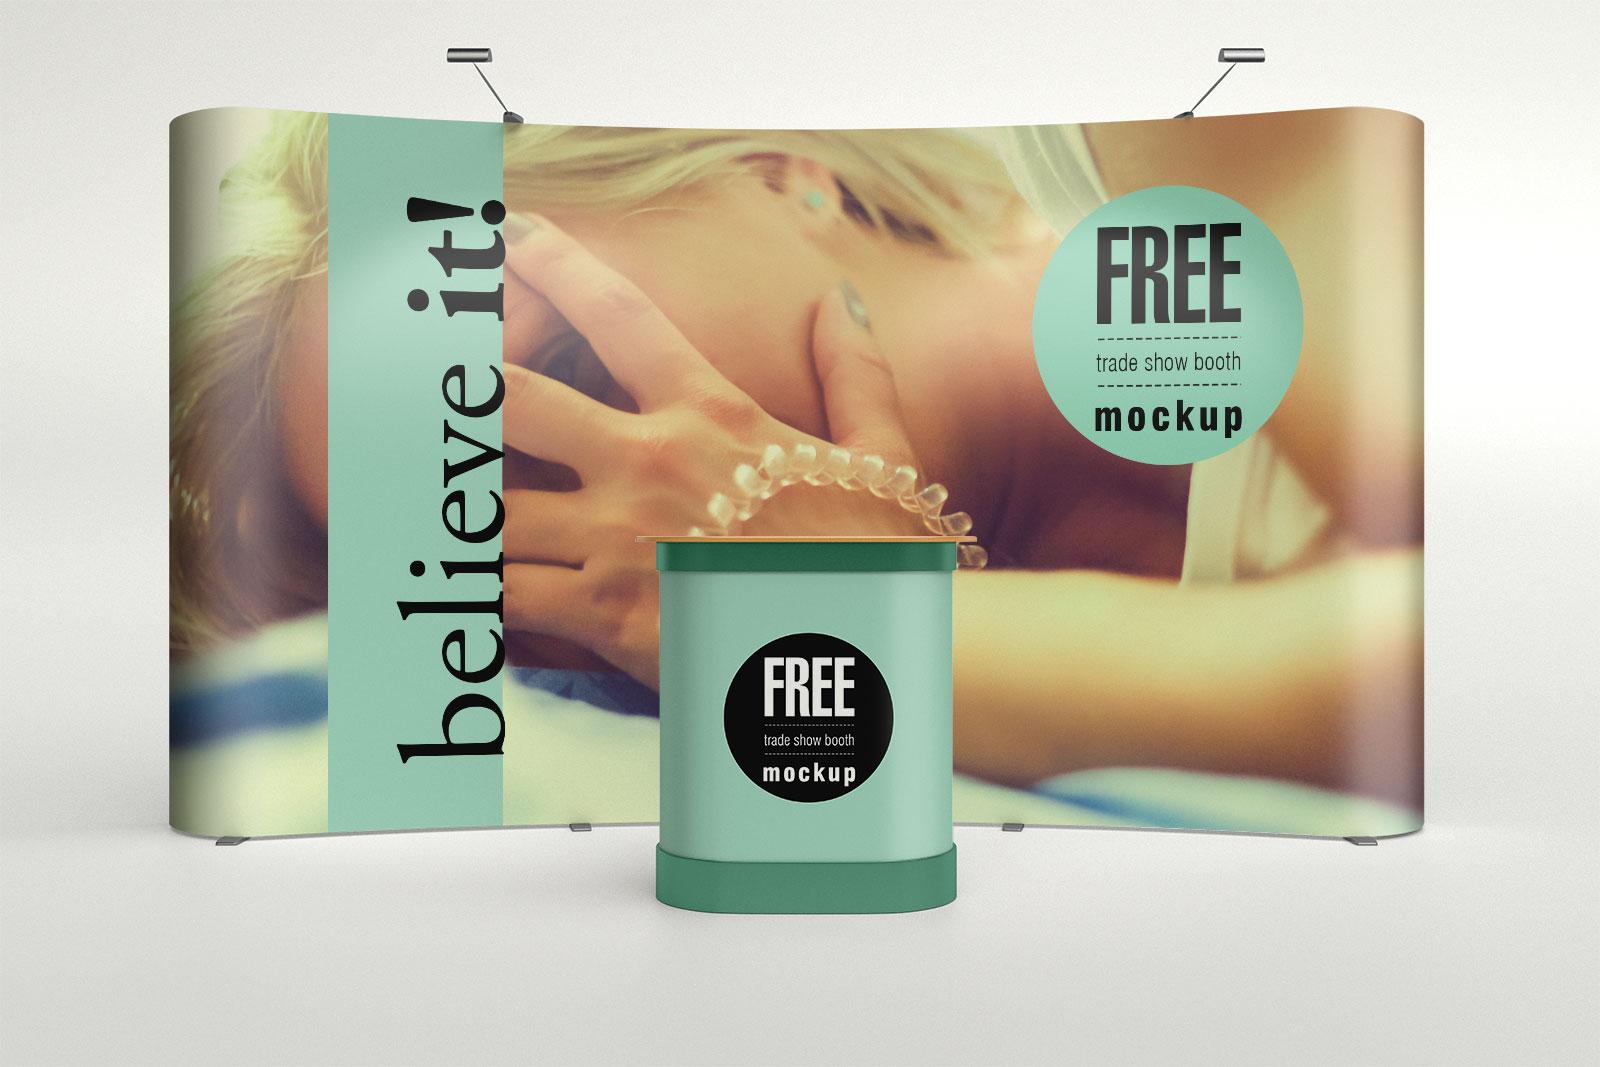 Free-Premium-Trade-Show-Booth-Mockup-PSD-File